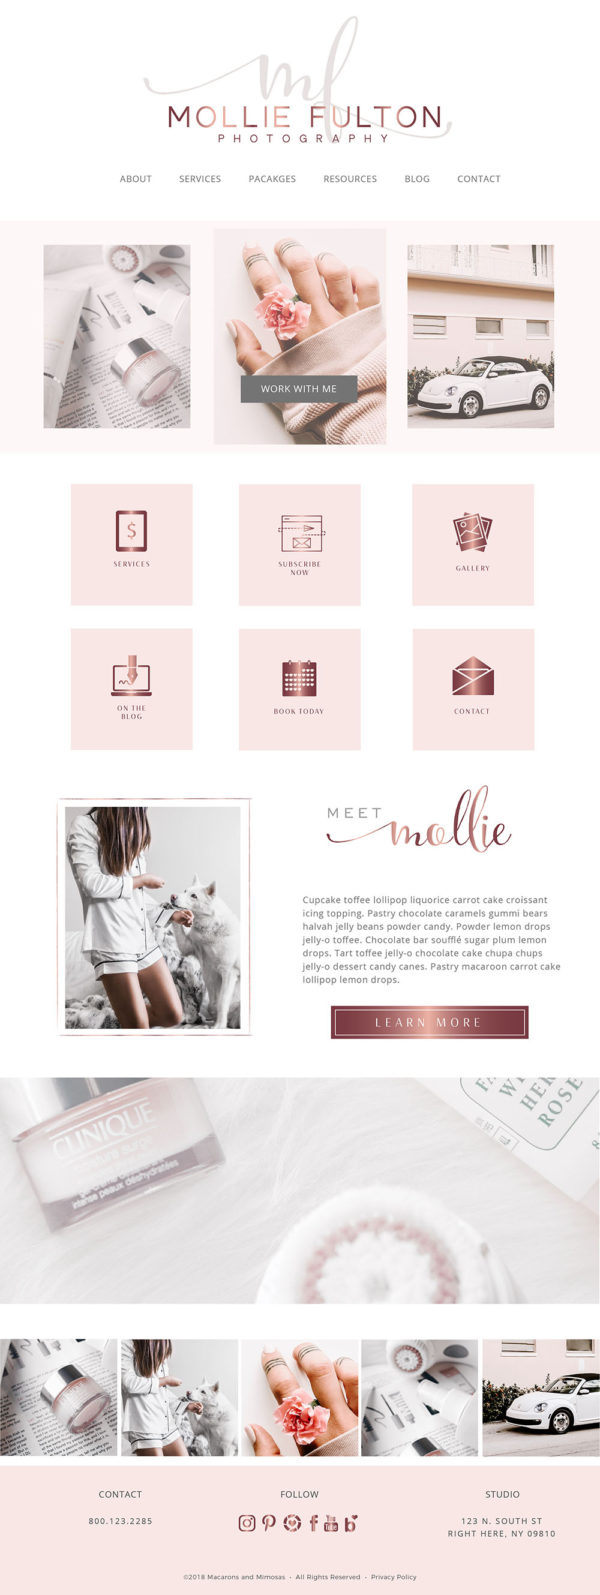 Wordpress Template, studiopress theme, wordpress website tempalte, showit templates, showit themes, blog kits